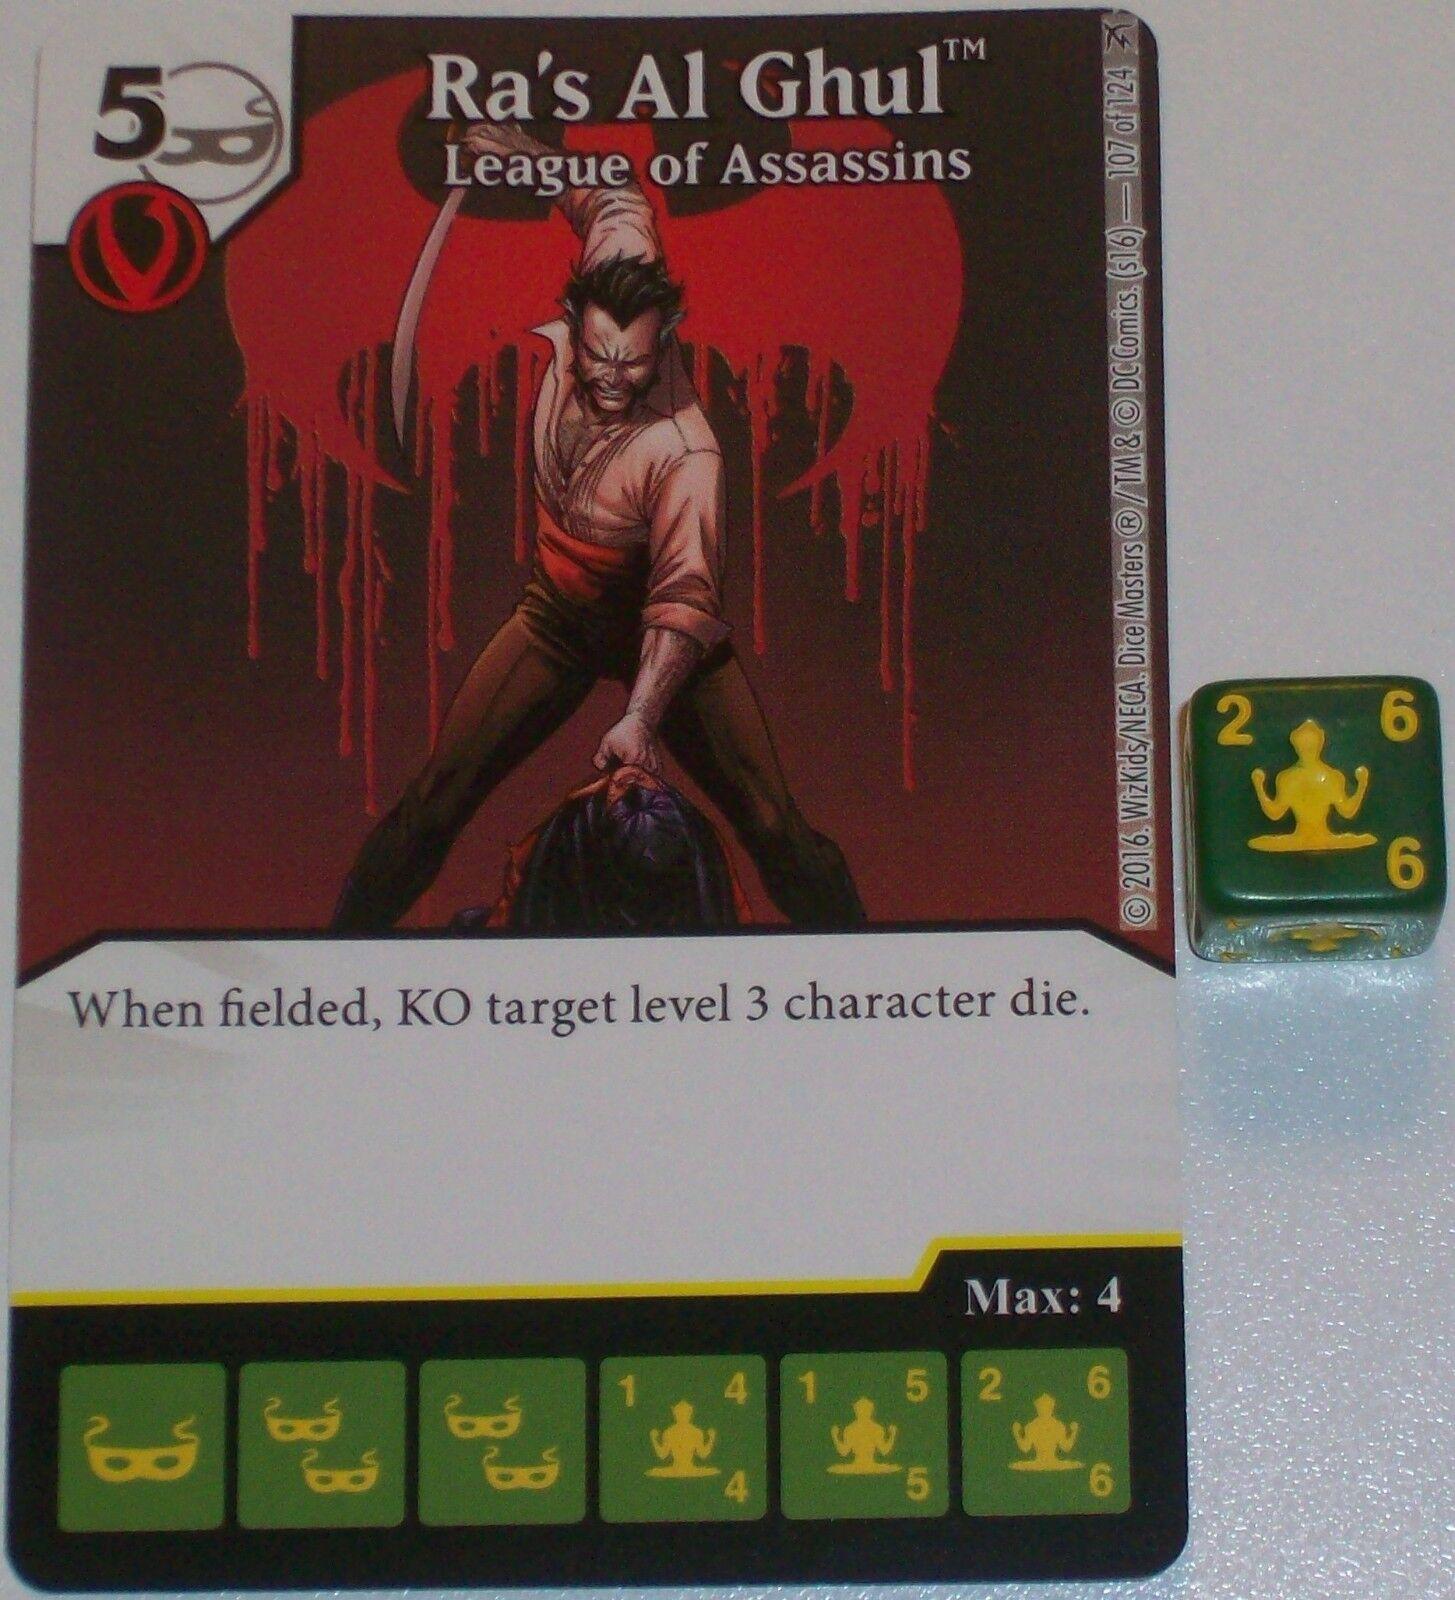 RA'S AL GHUL: LEAGUE OF ASSASSINS 107 Green Arrow & The Flash Dice Masters Rare